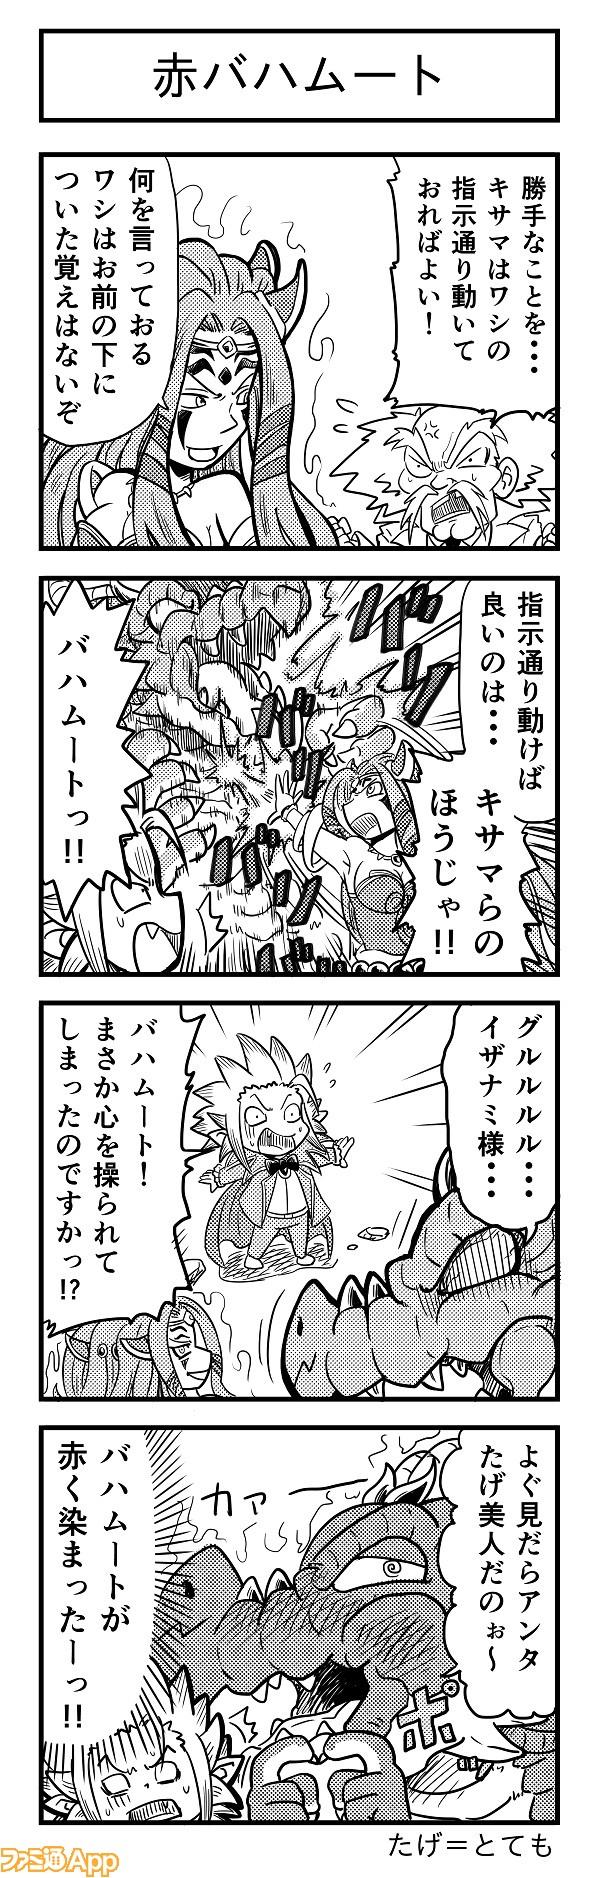 4koma279翻訳修正